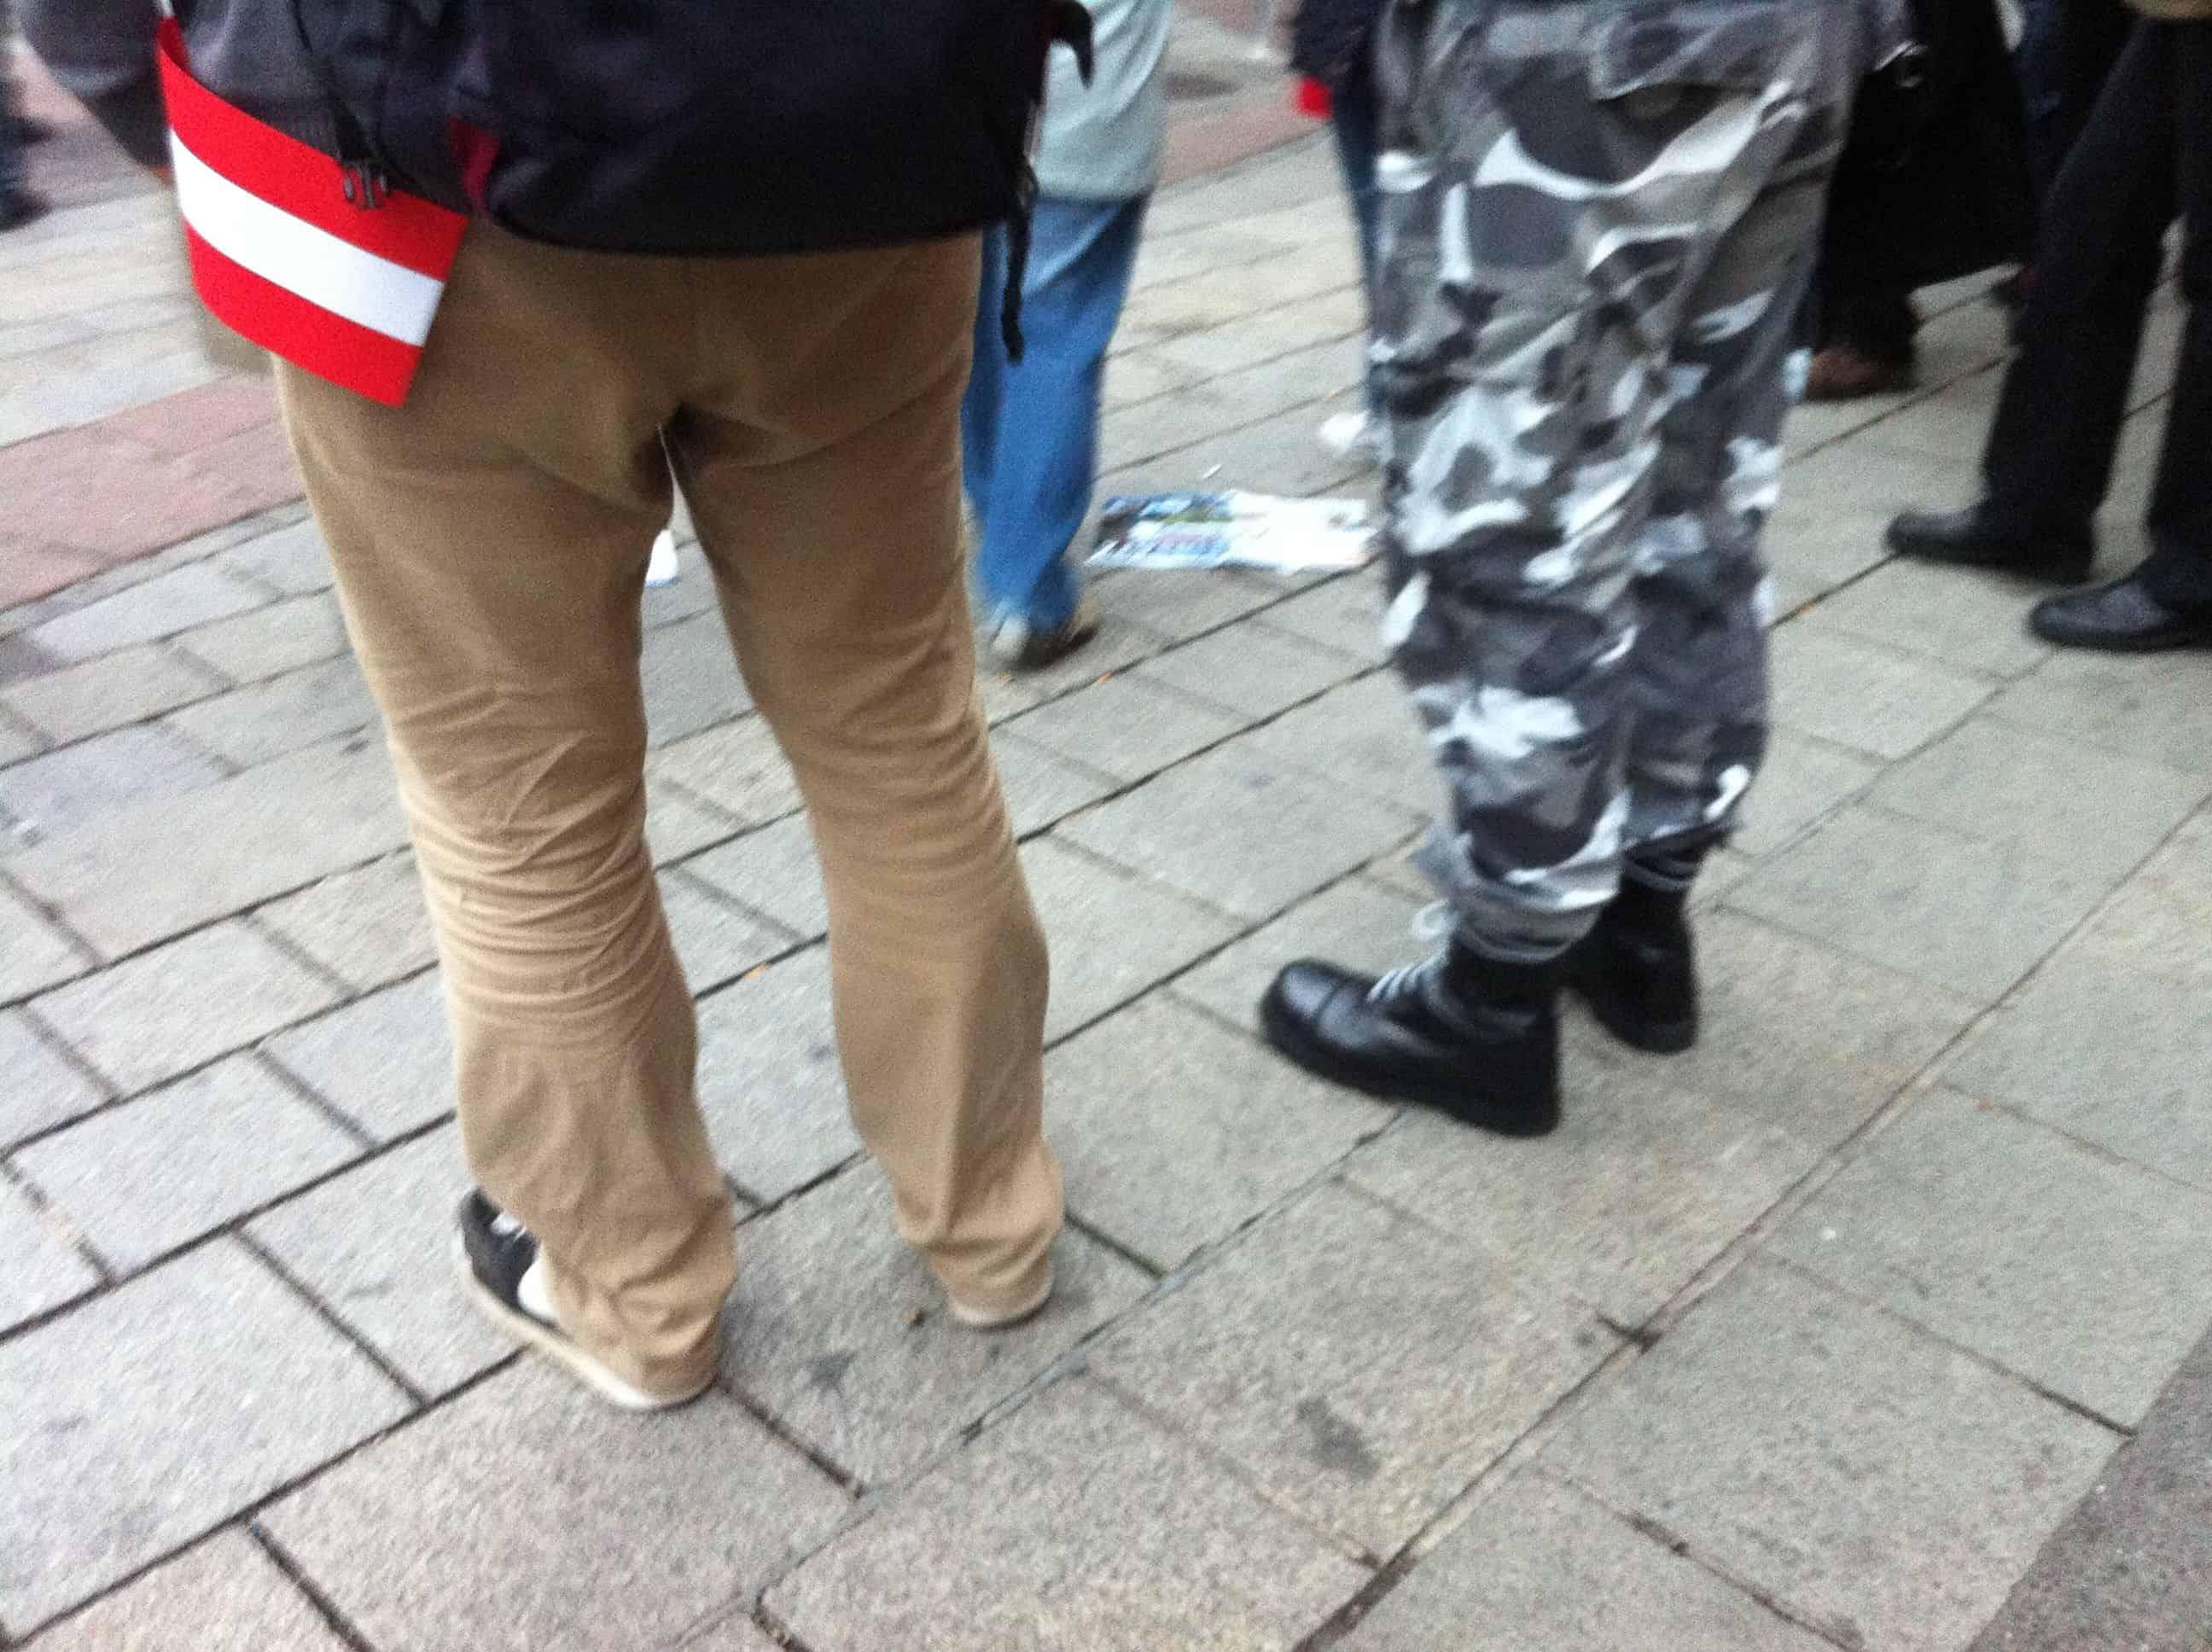 Strache-Demo: Skinhead festgenommen